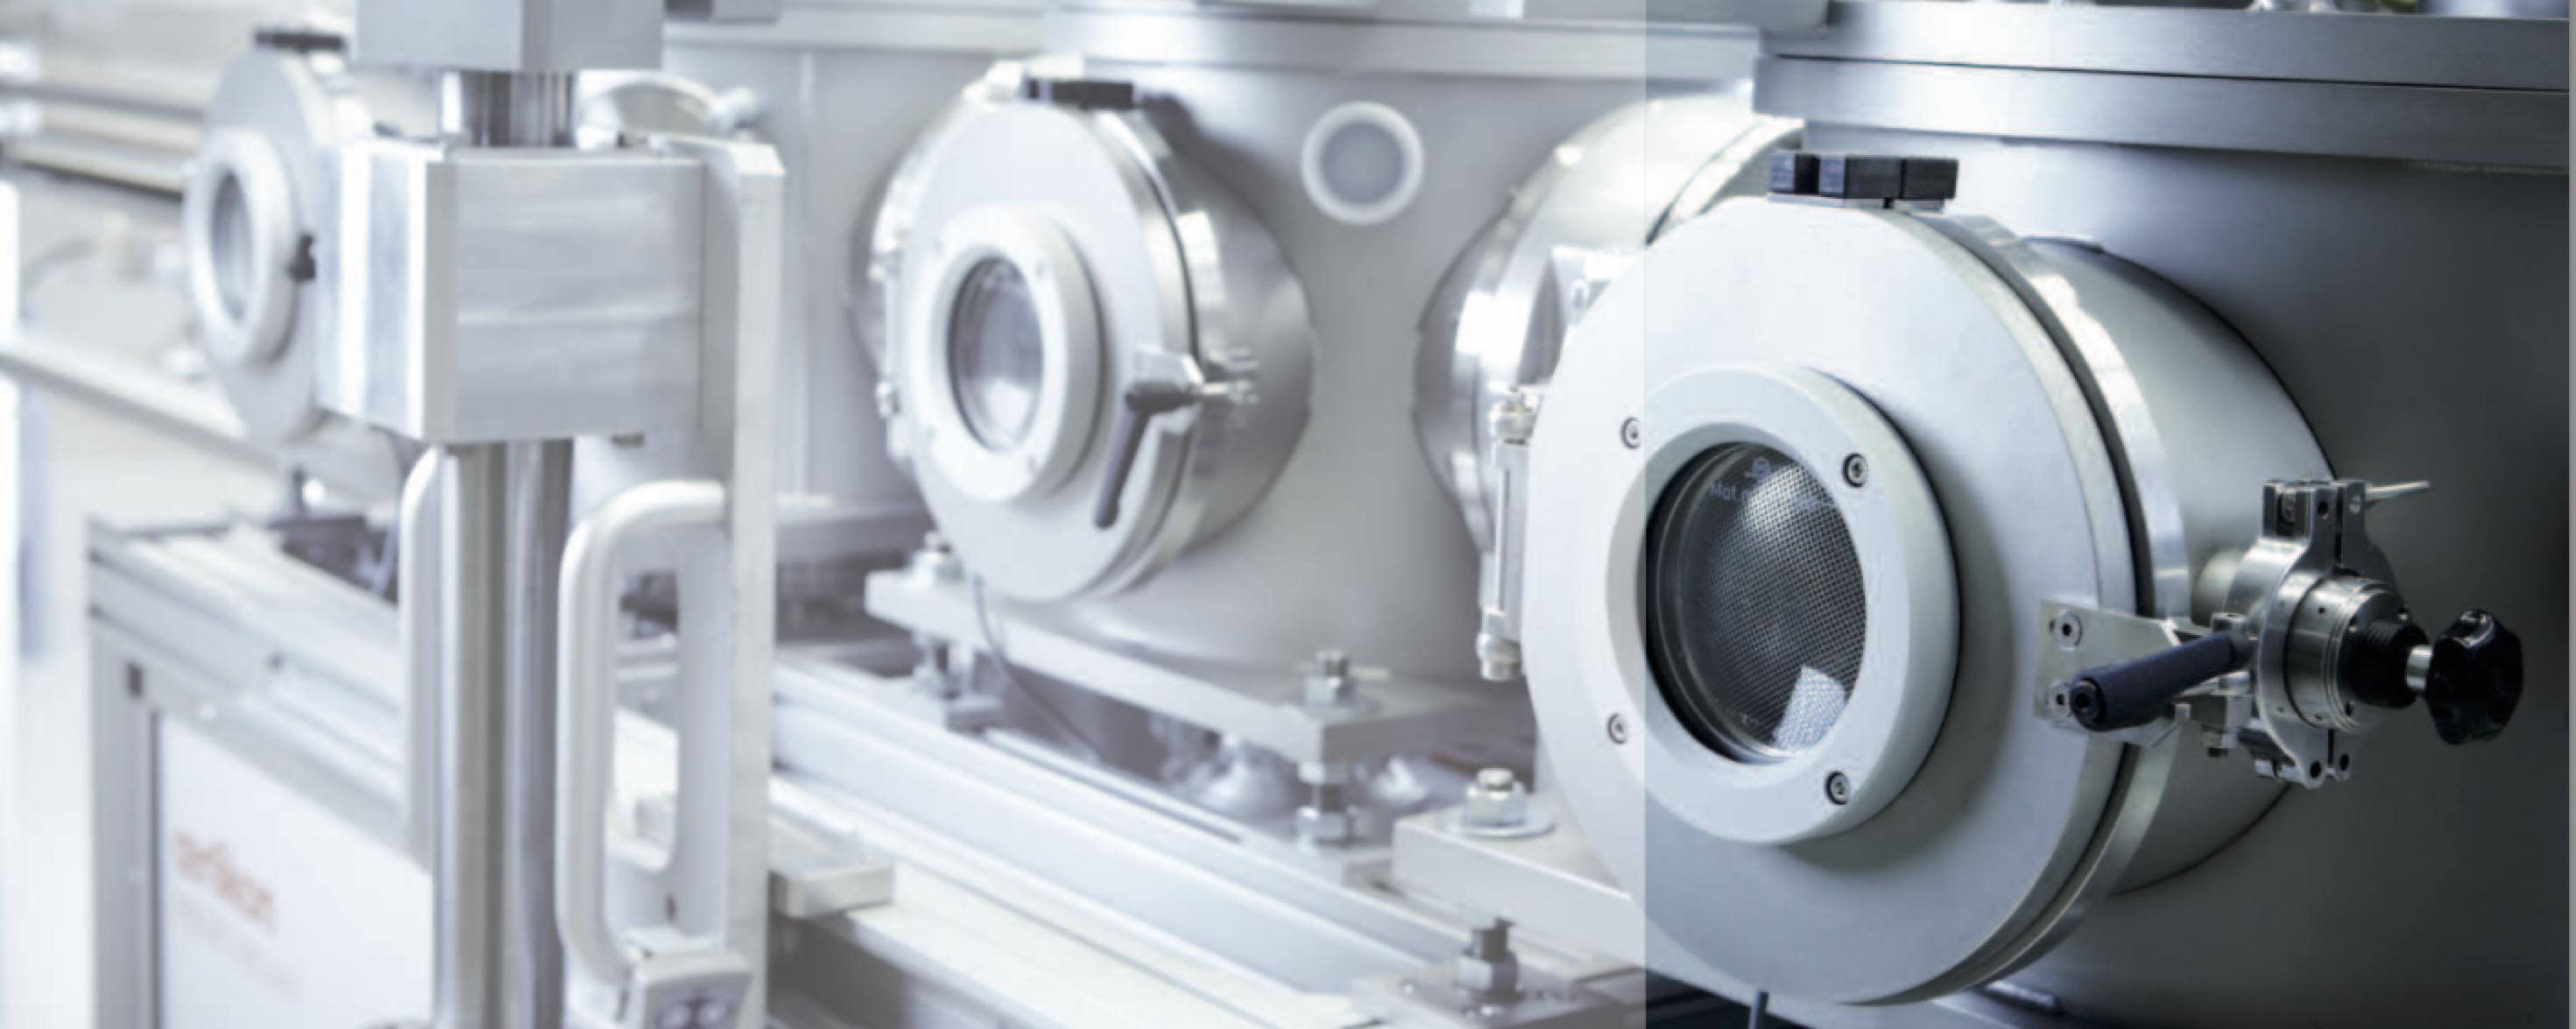 Thin Film Deposition for Vacuum Coating